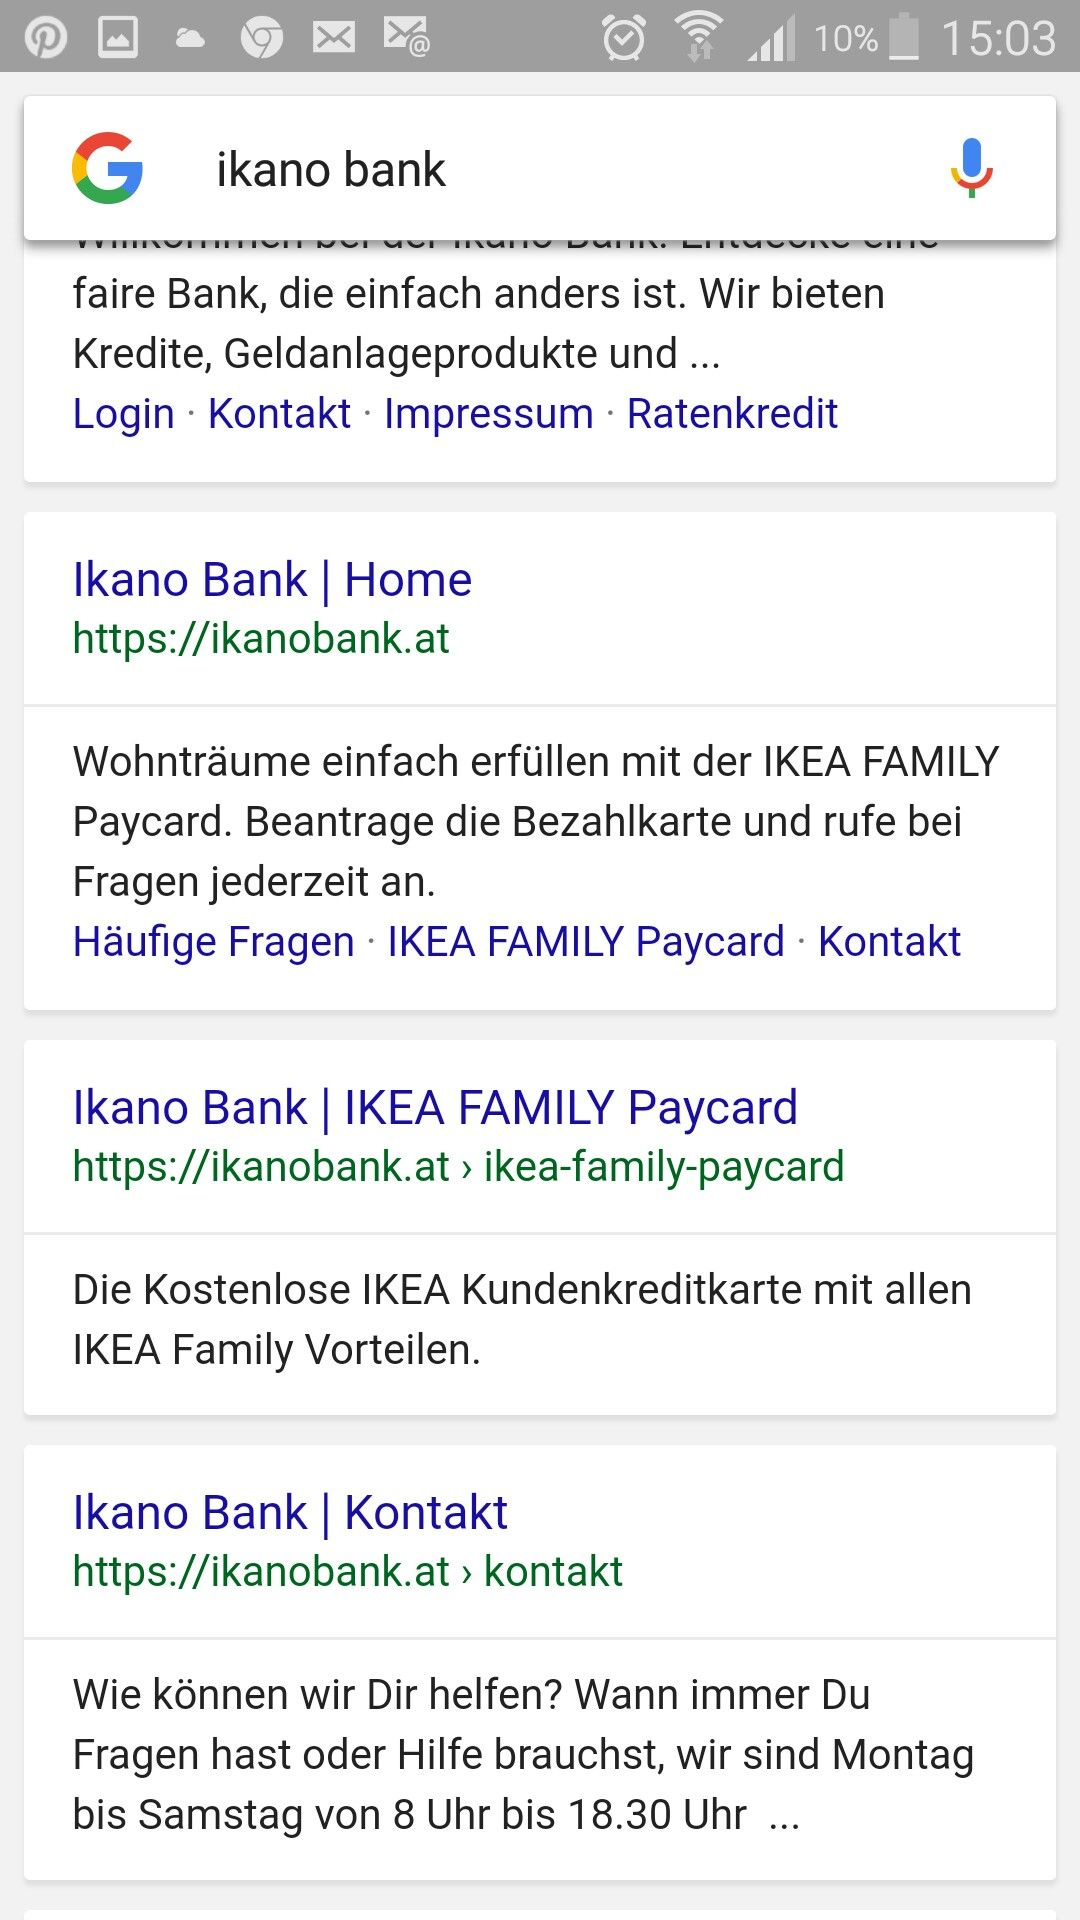 Einzigartig Ikano Bank Ikea Bezahlkarte Design